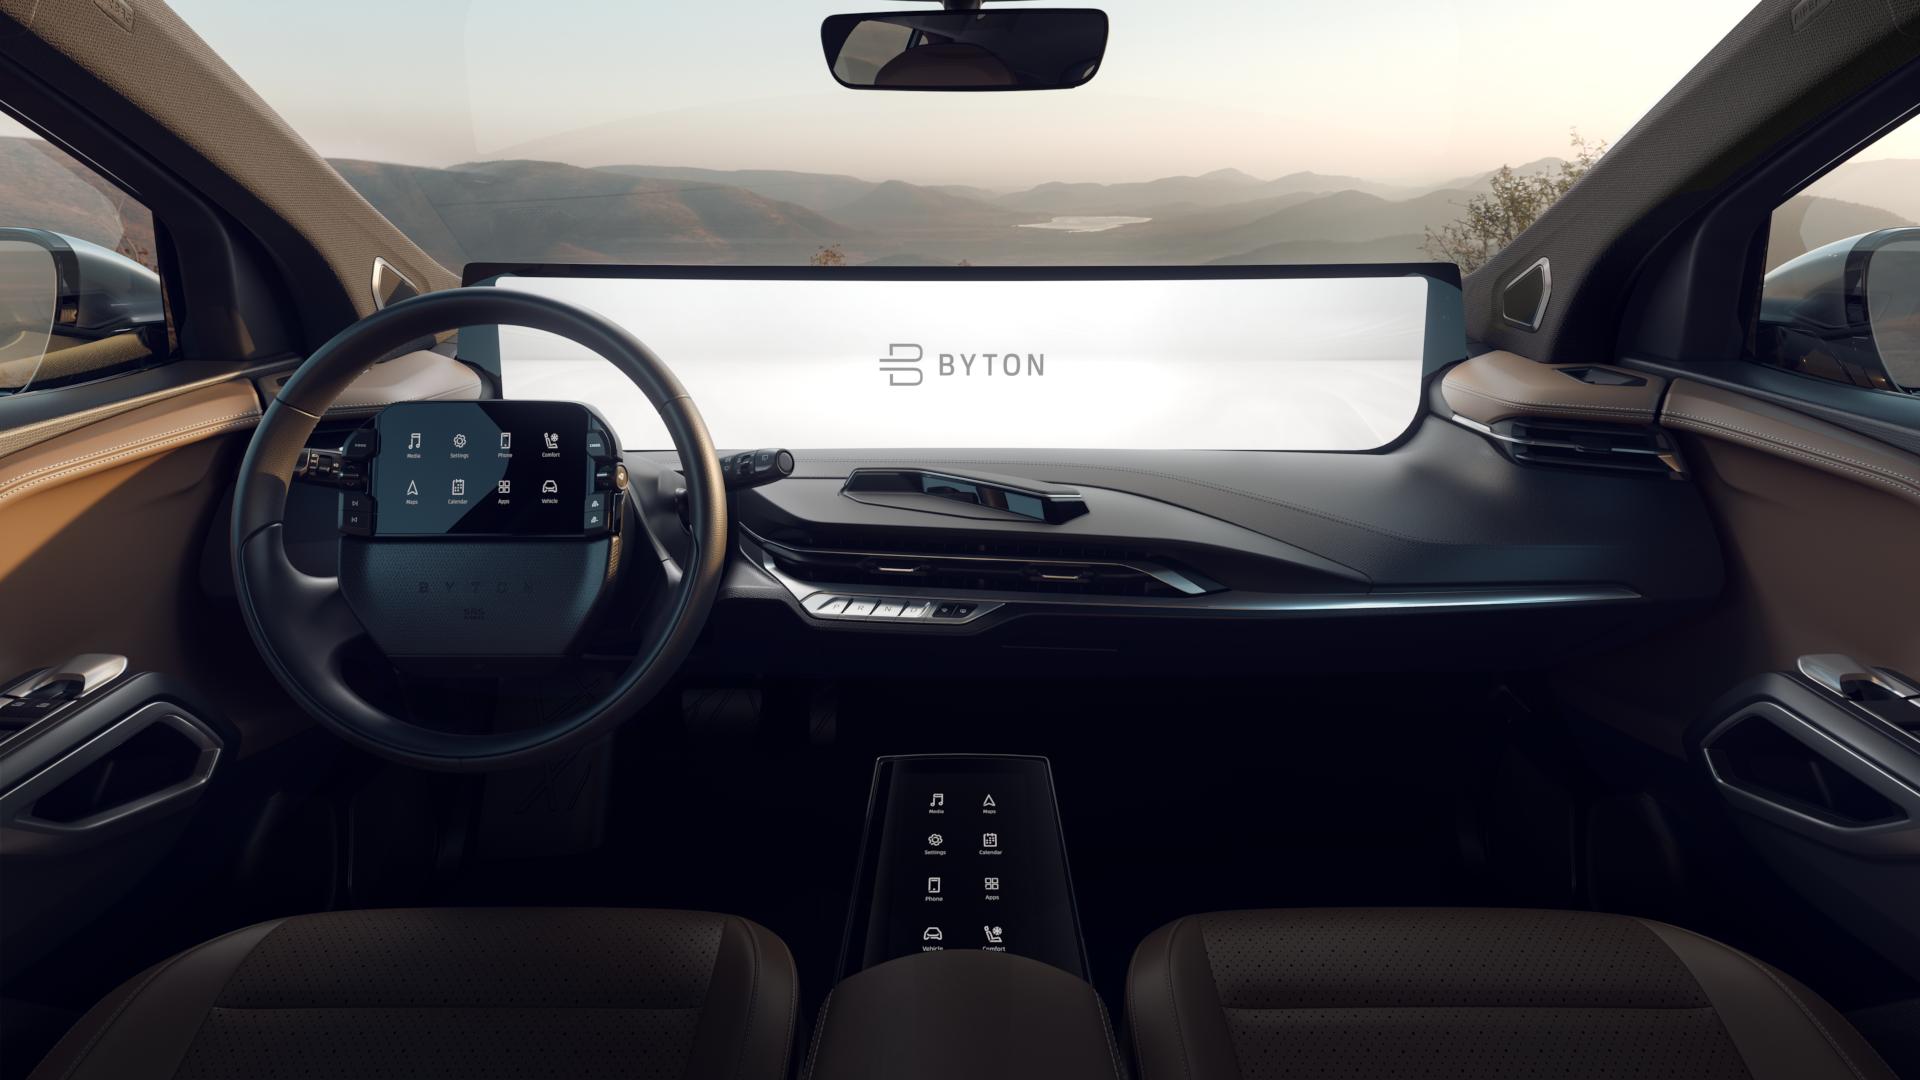 Byton M-Byte interior CES 2019